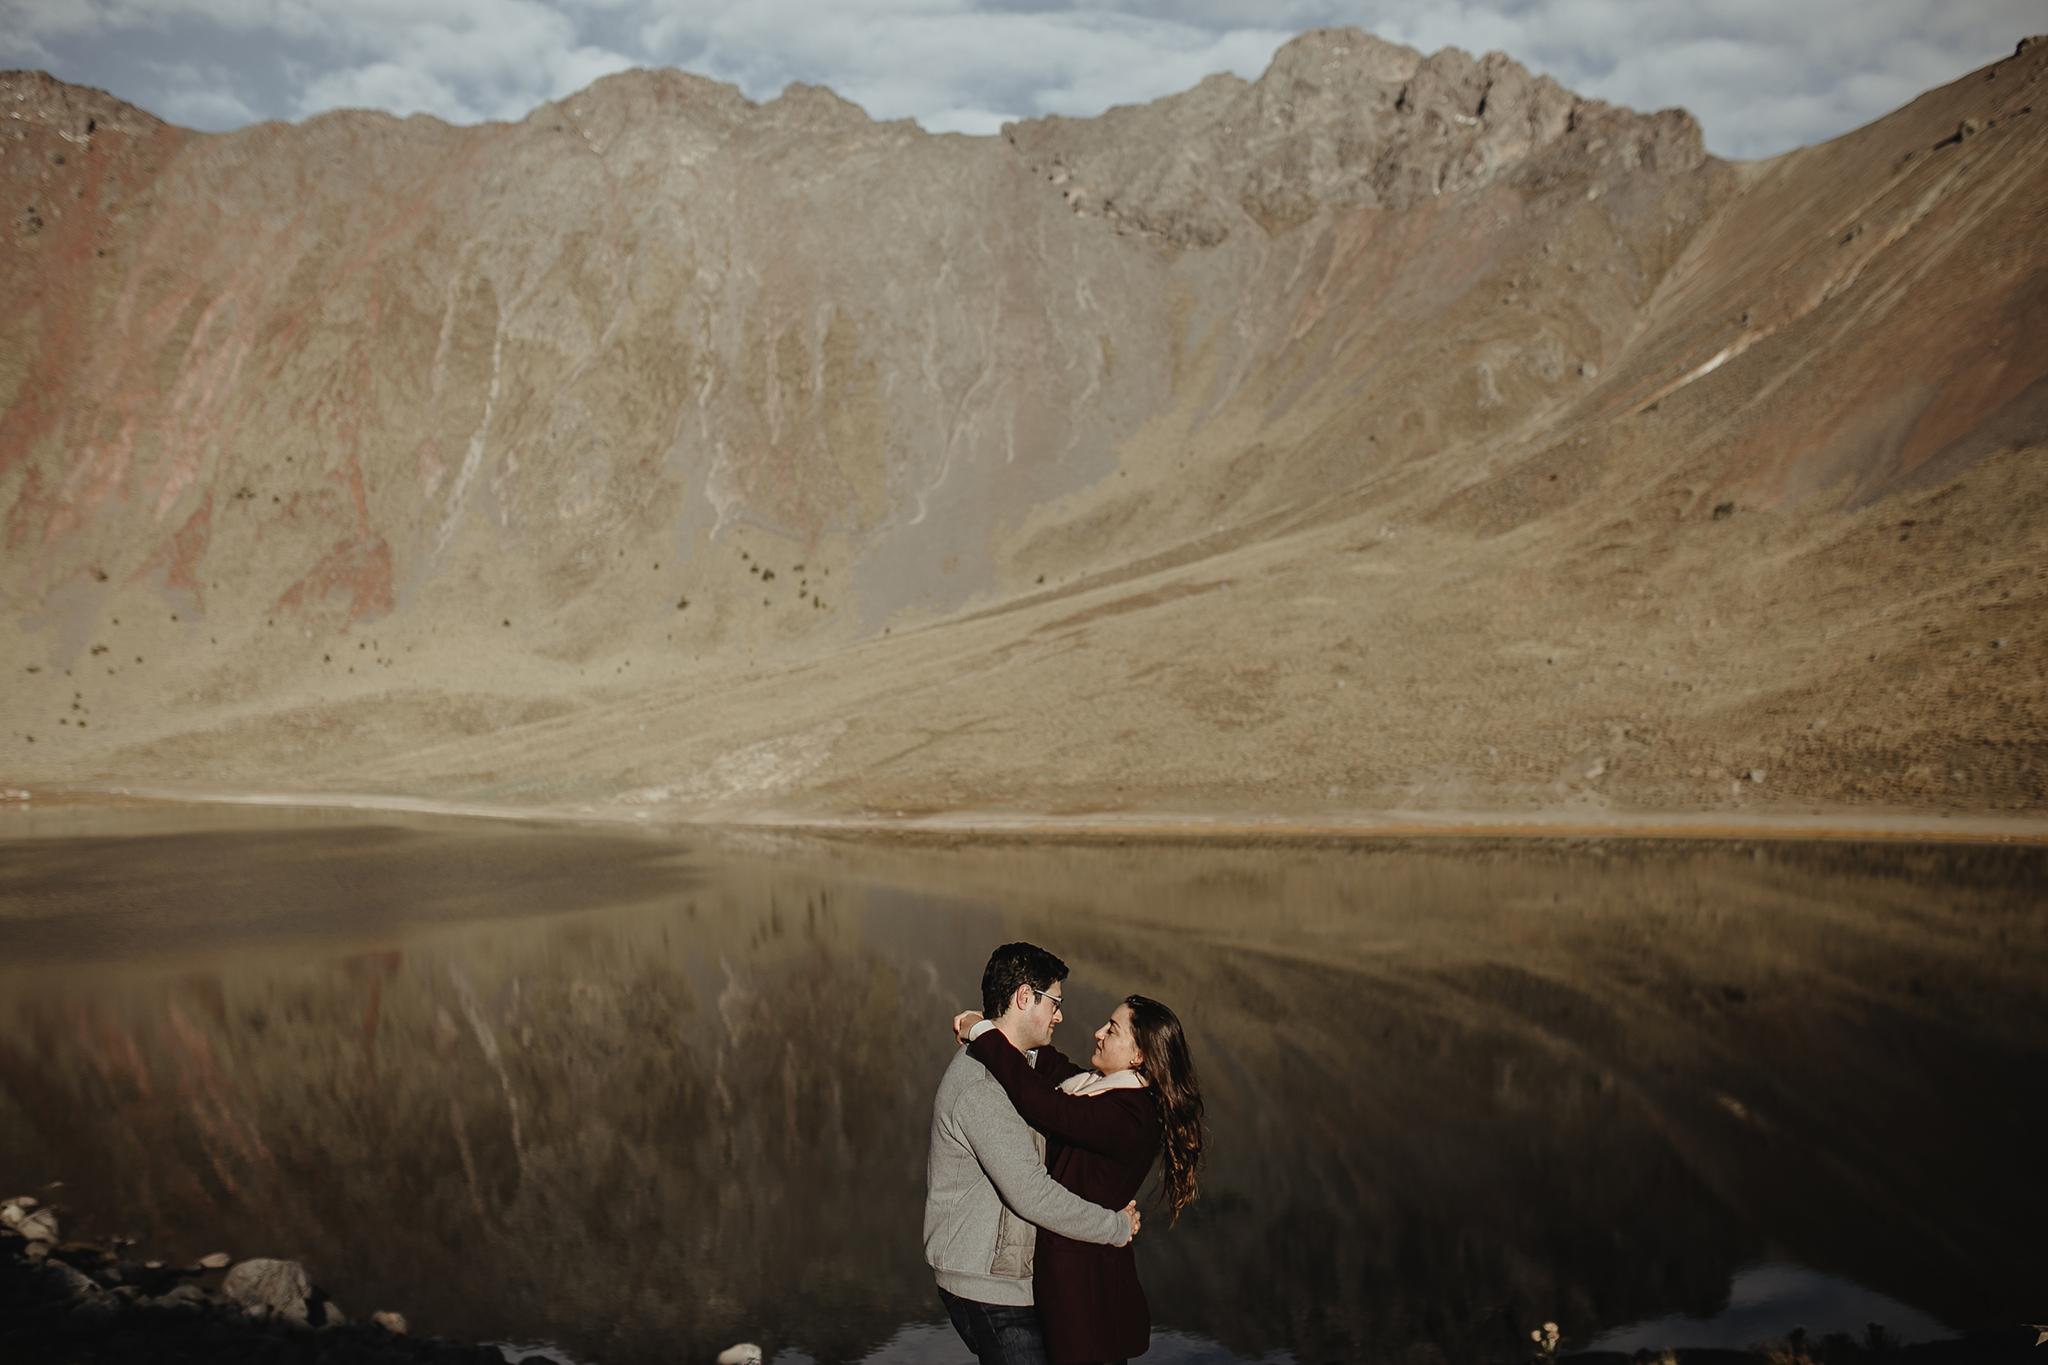 0164L&R_nevado_engagement_WeddingPhotography_Wedding_Boda_WeddingDestination_BodasYucatan.jpg